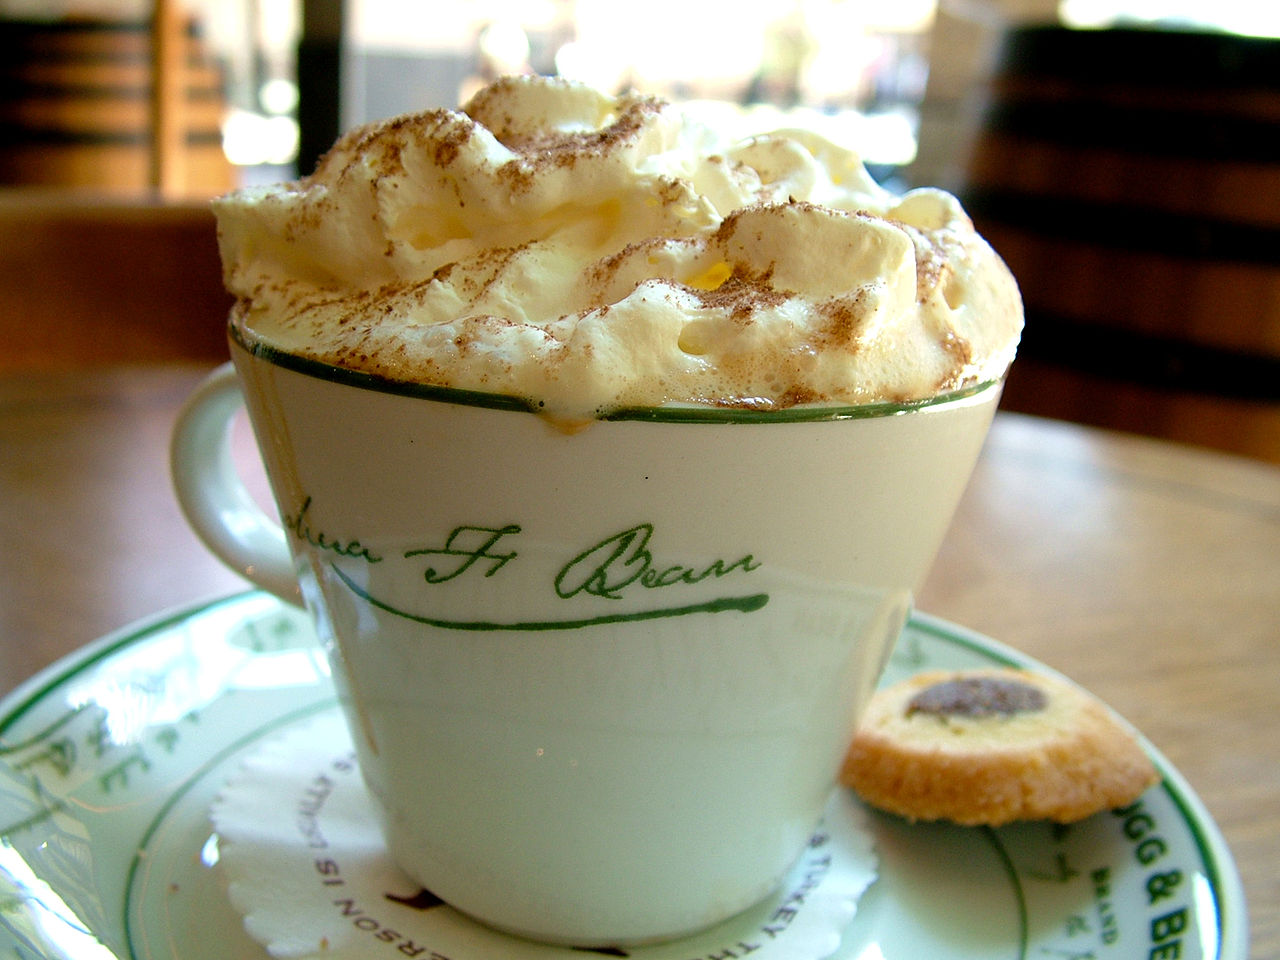 Cup  Cafe Cape Cod Nitro Coffee